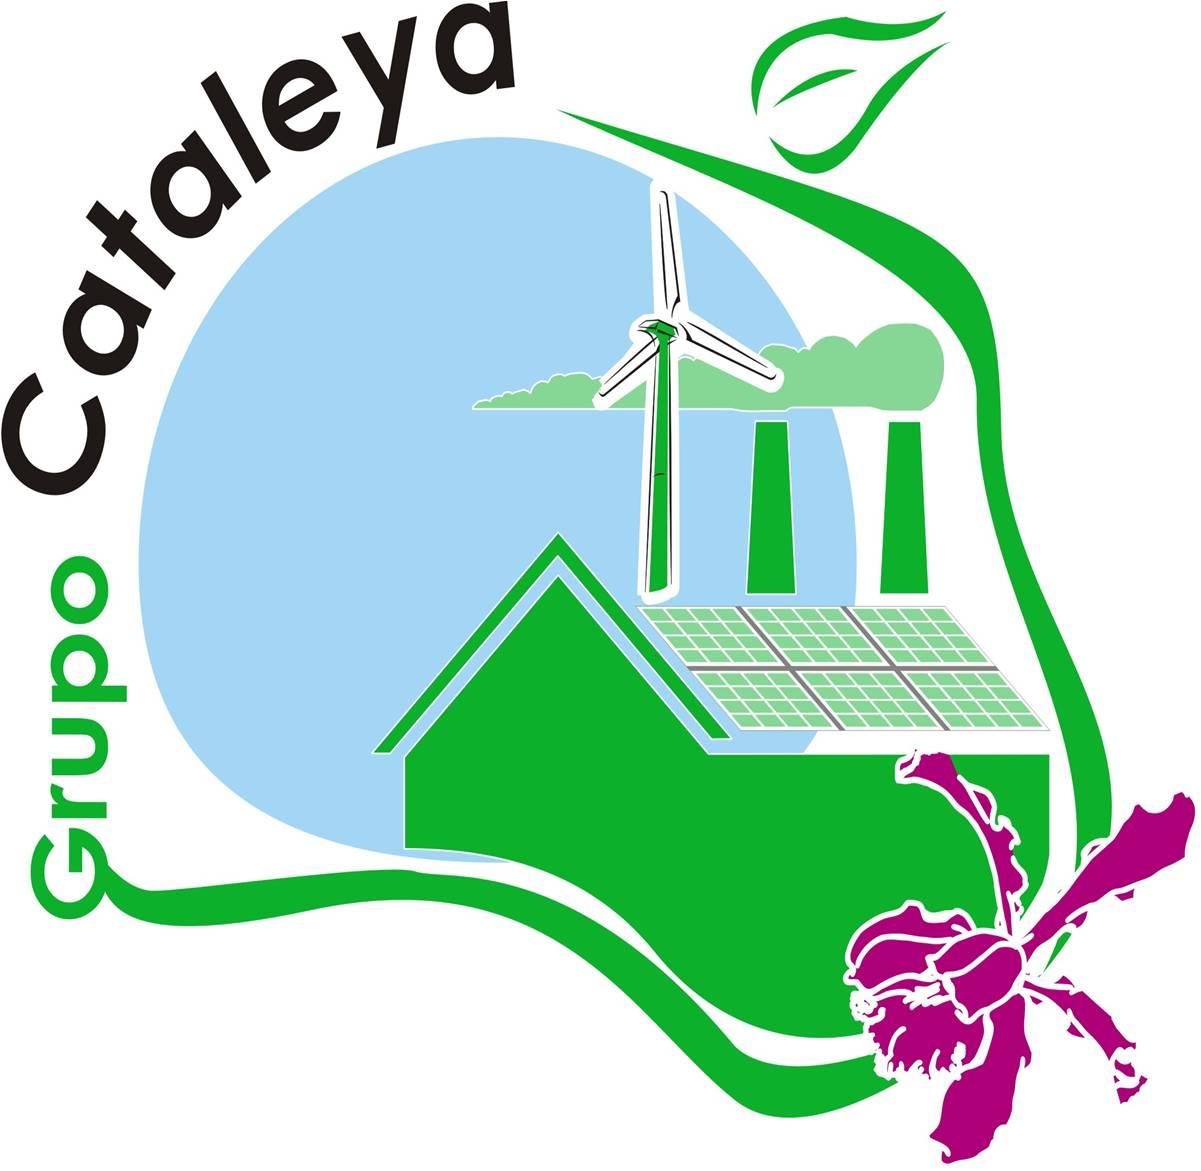 Mantenimiento Cataleya